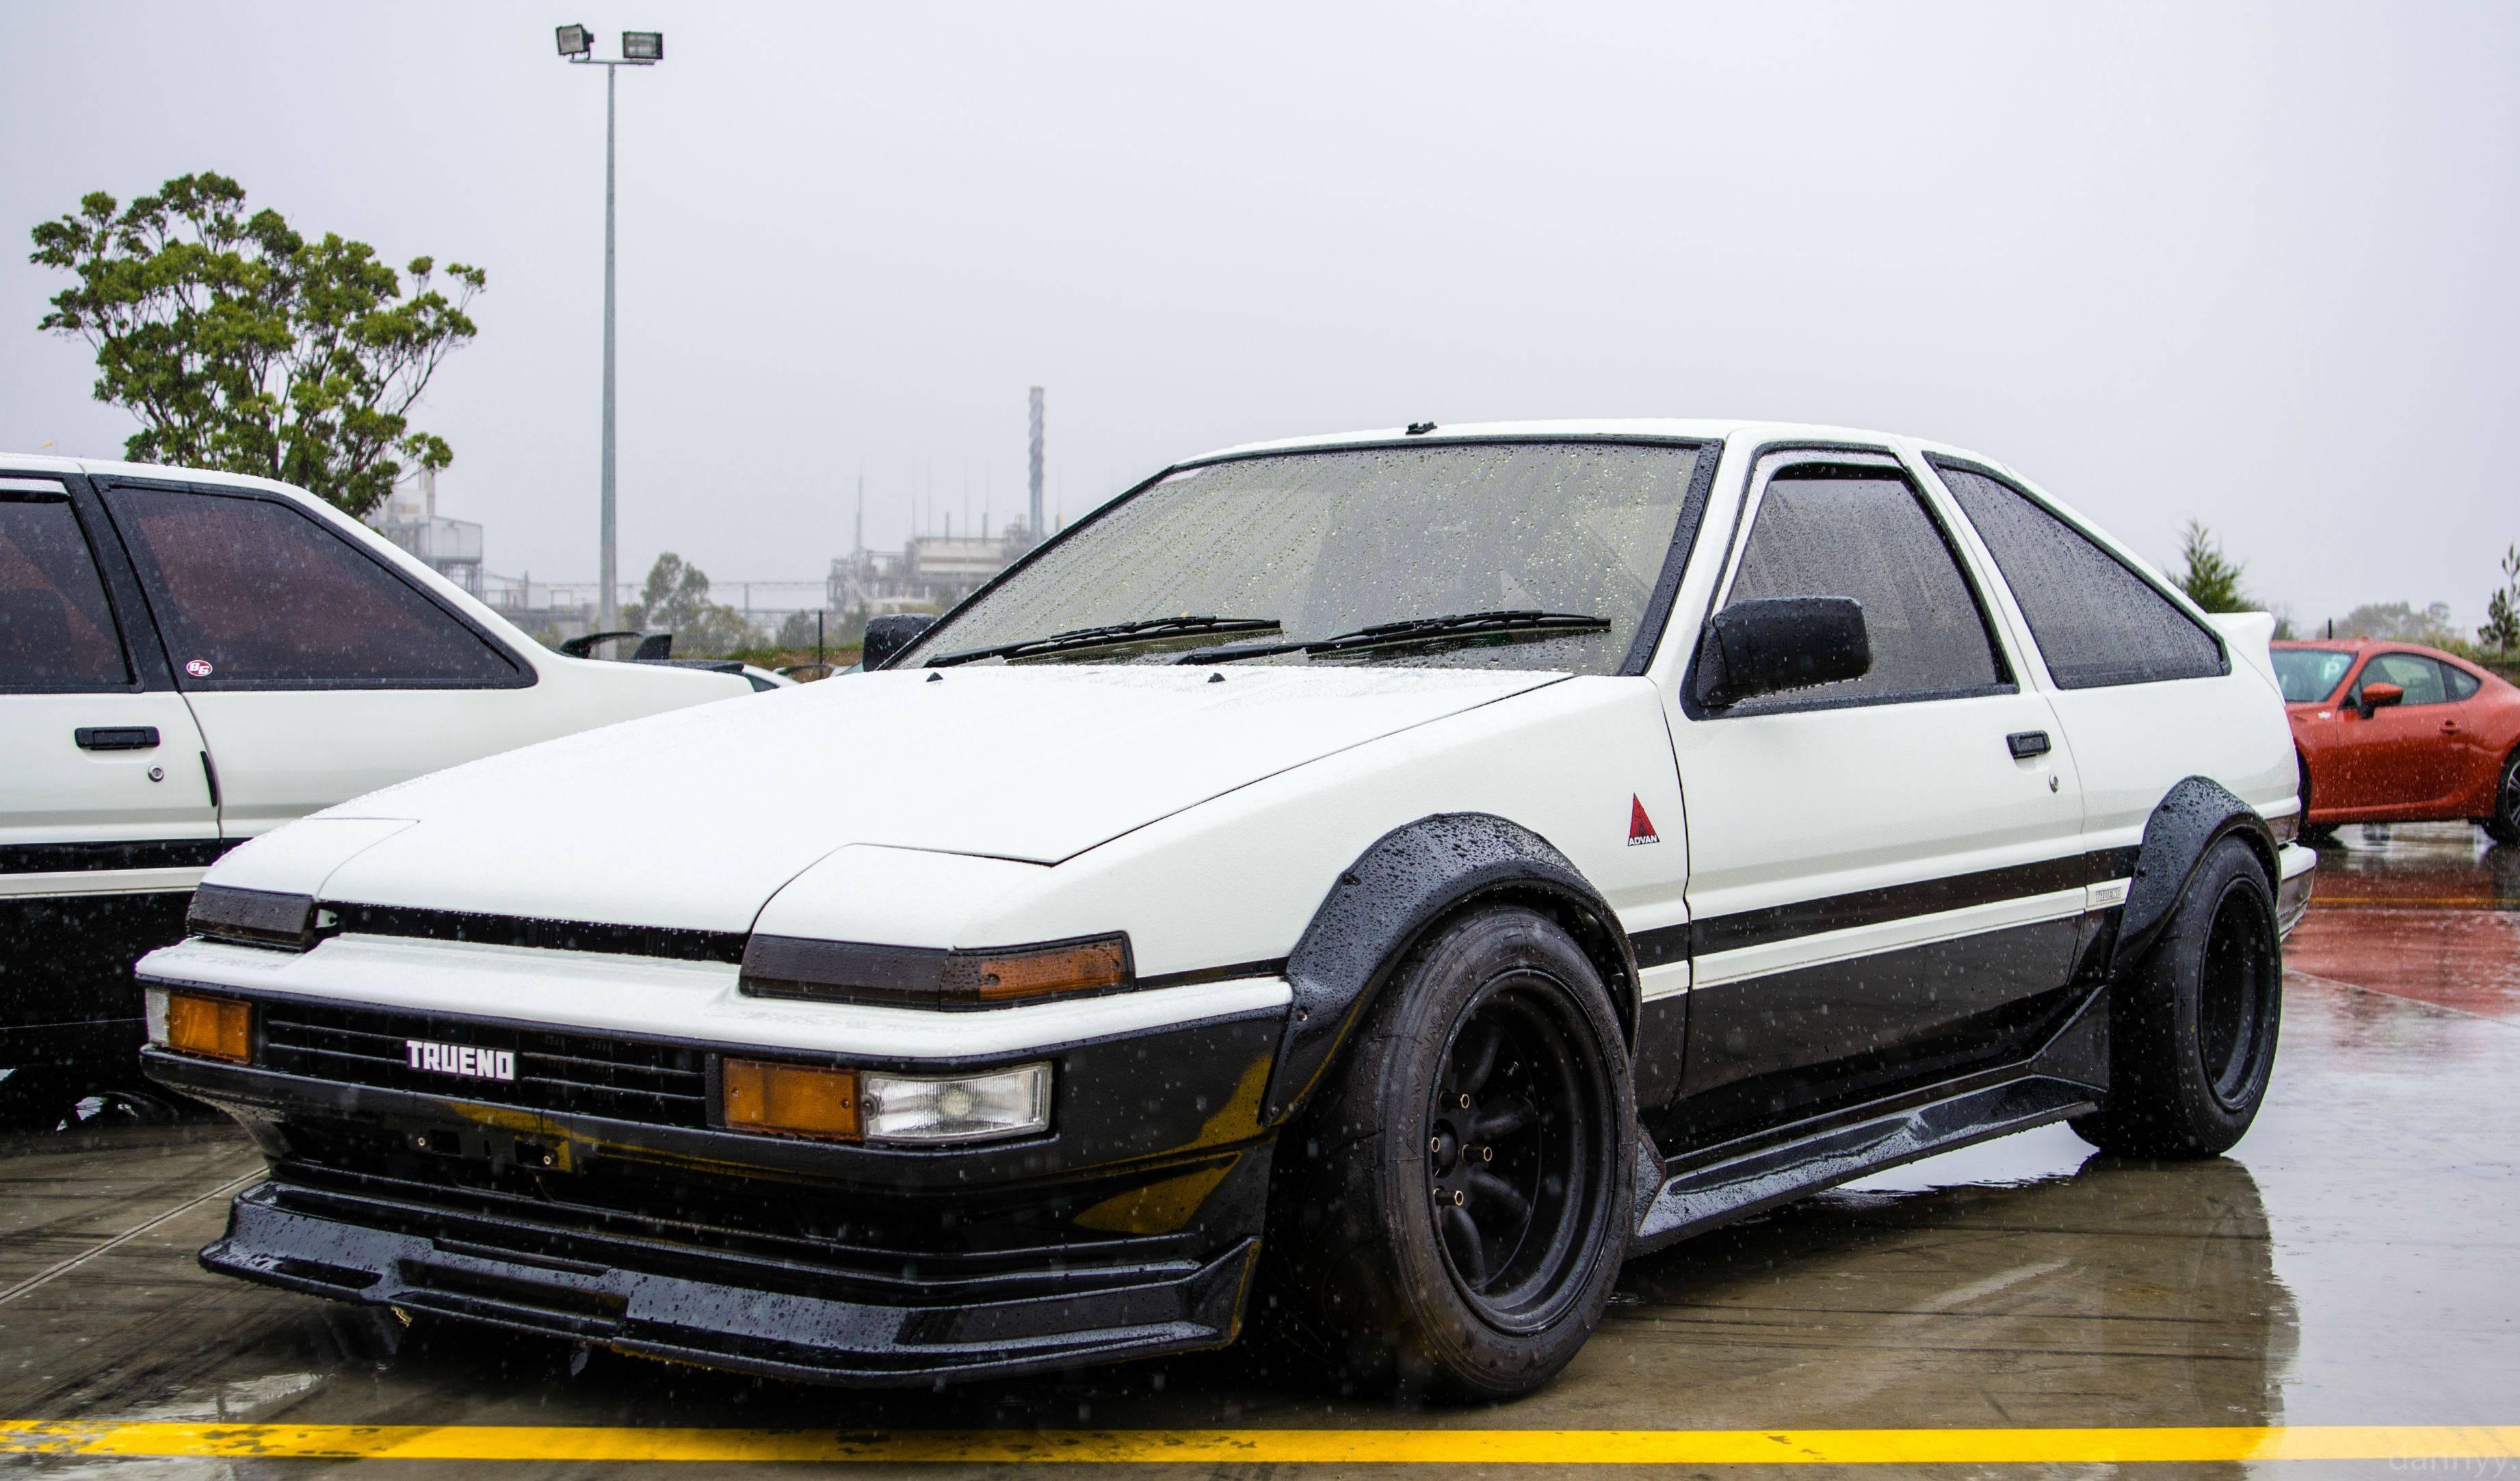 Wallpaper : Japanese cars, JDM, sports car, white cars ...